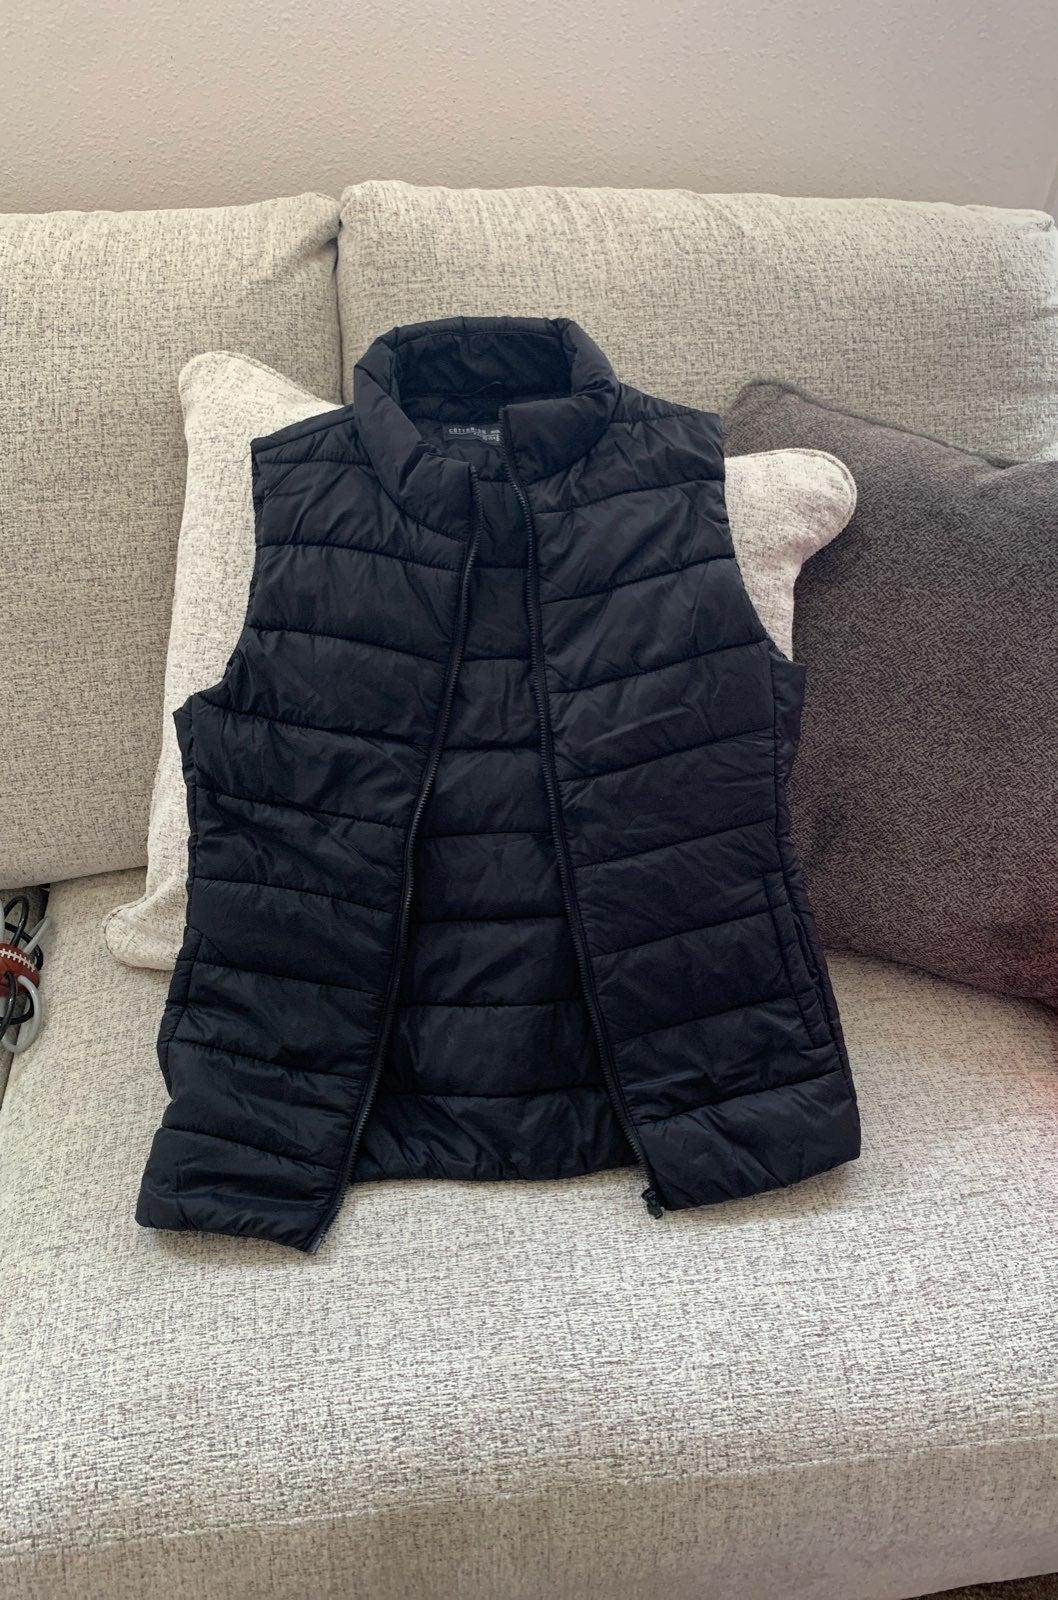 Cotton on puffer vest